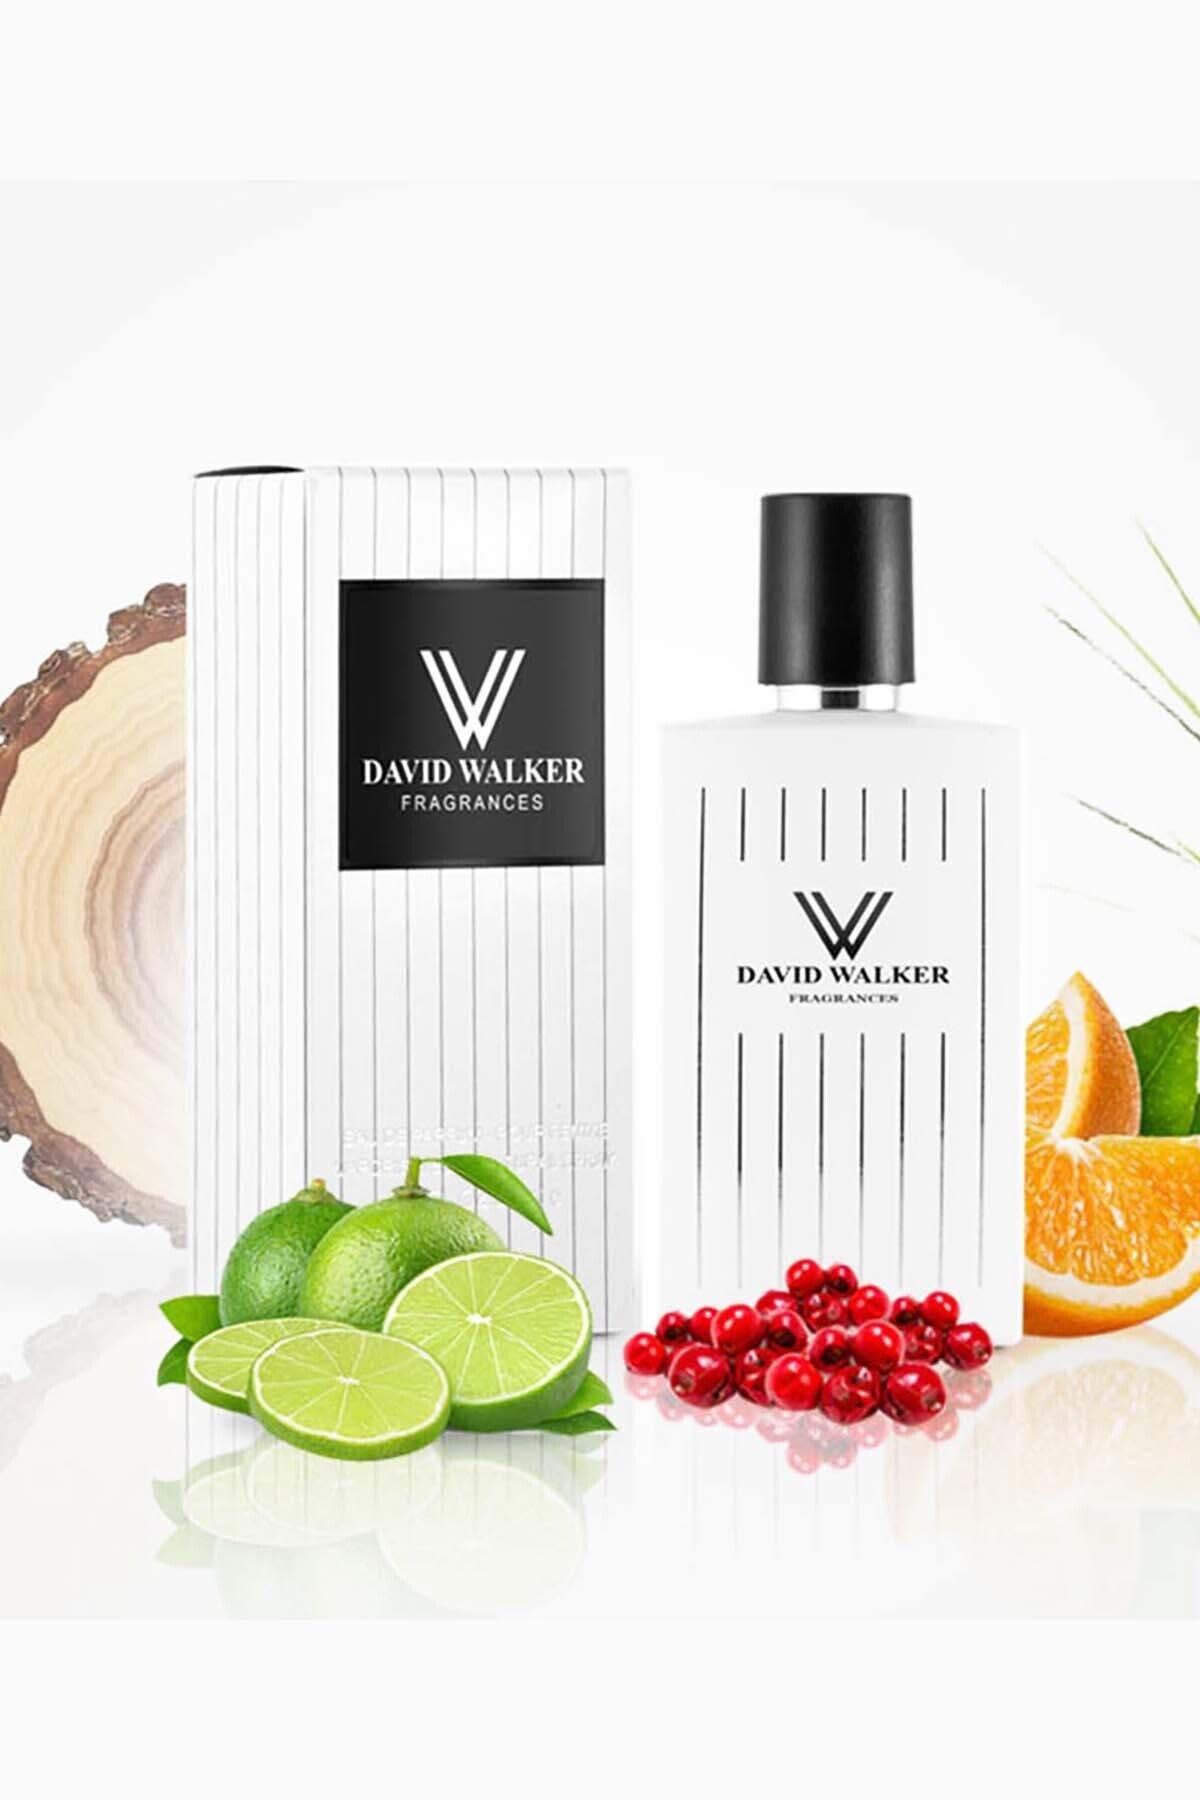 David Walker Brıselı B174 50ml Oryantal Kadın Parfüm 1